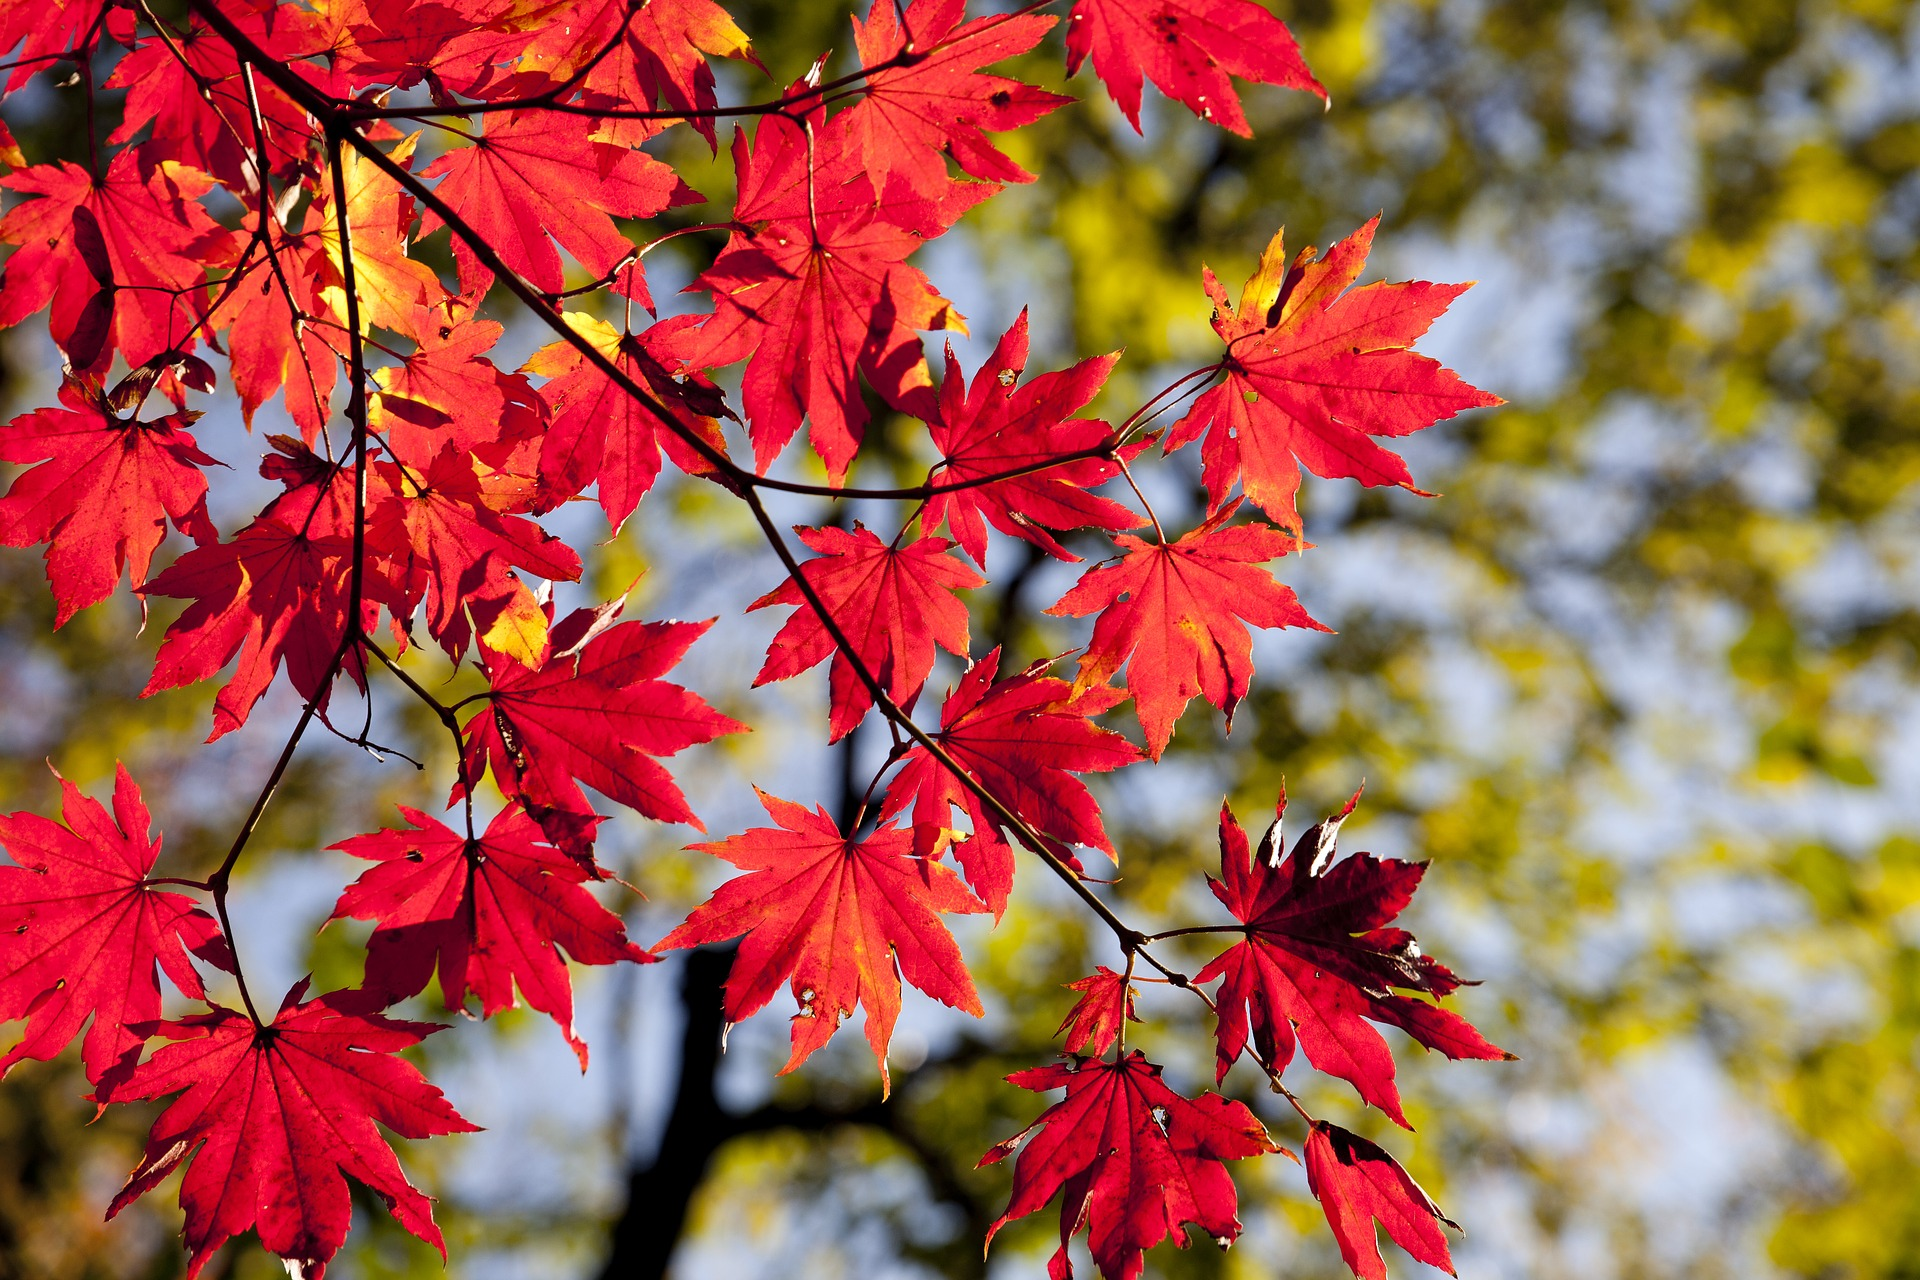 https://pixabay.com/it/photos/foglie-di-autunno-acero-le-foglie-2789234/